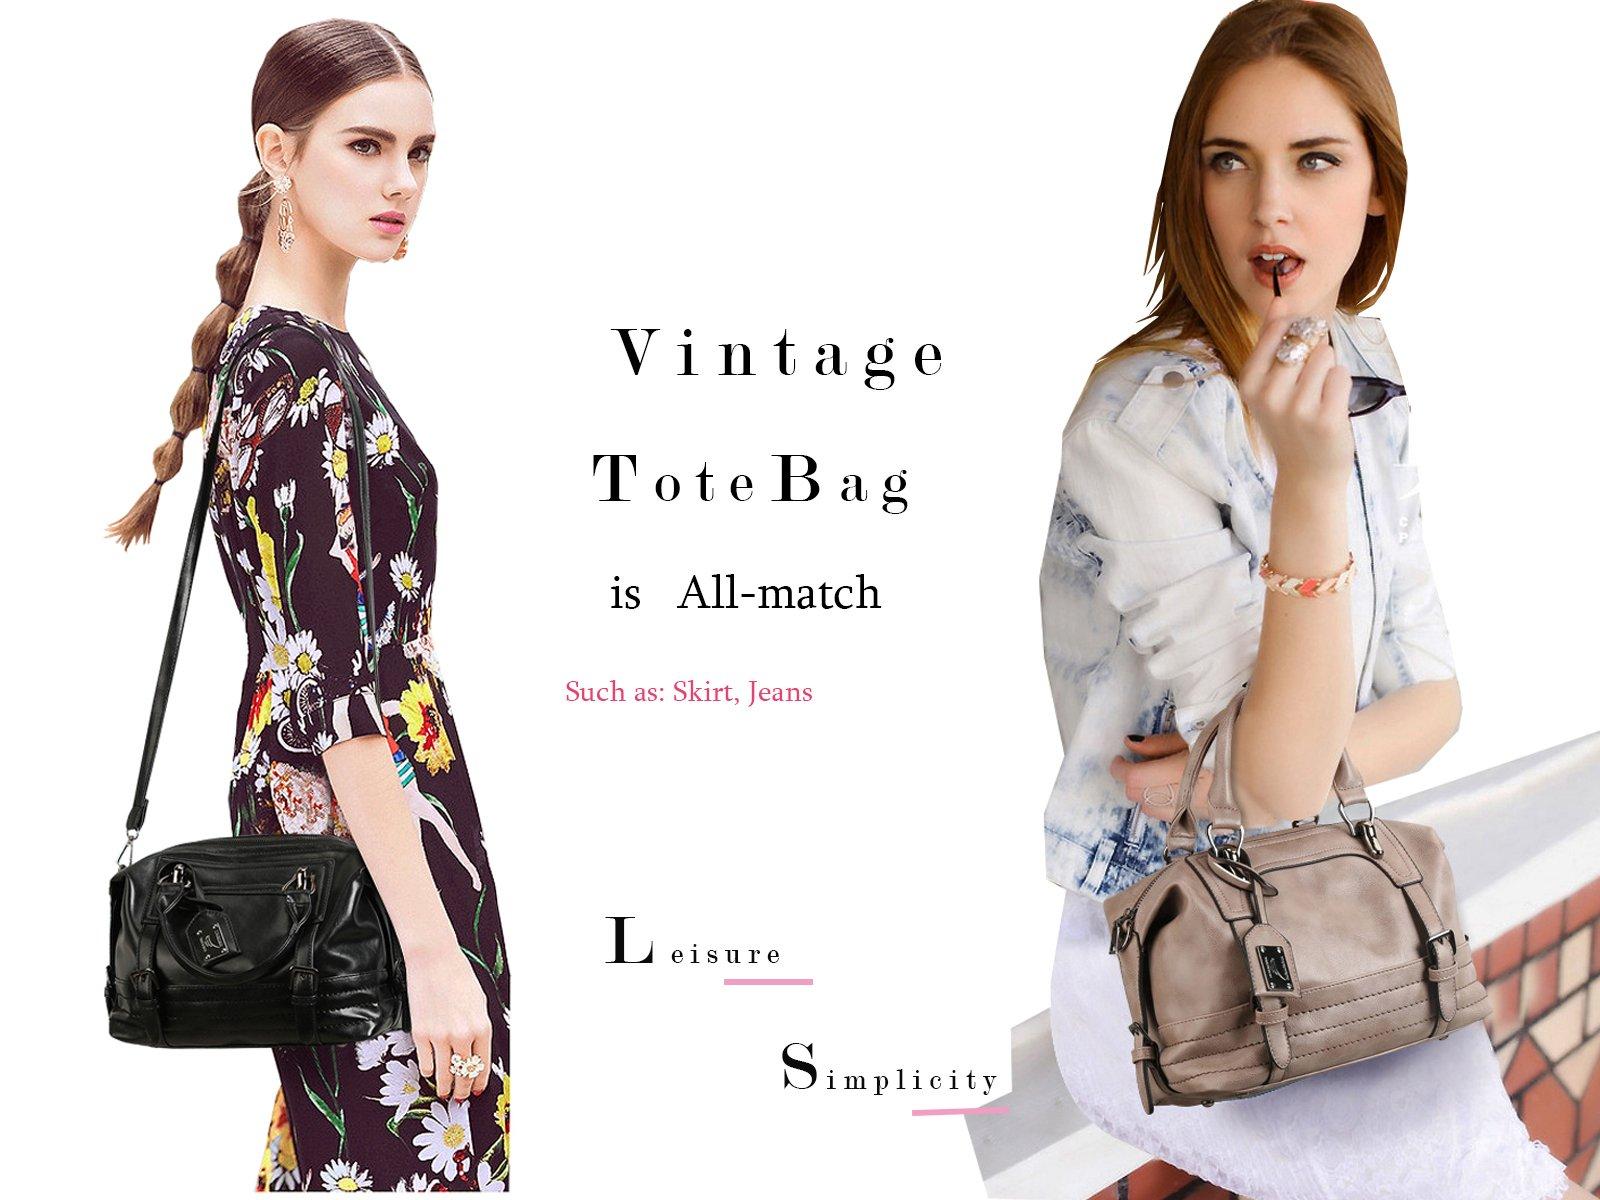 Juilletru Black Women Tote Bags PU Leather Handbags Top Handle Vintage Purse Crossbody Shoulder Bag by Juilletru (Image #7)